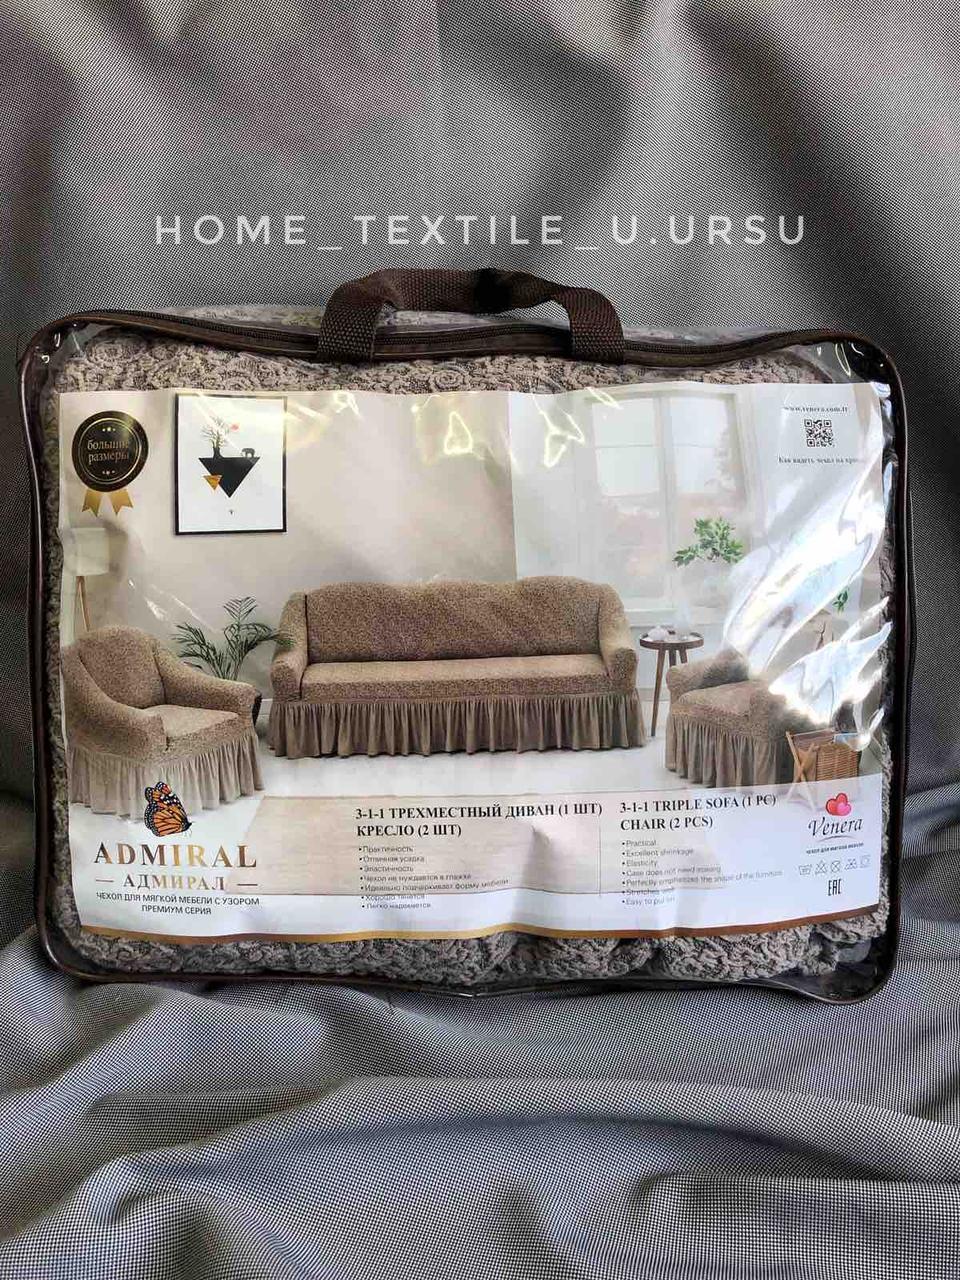 "Комплект чехлов жакард на диван и кресла с воланами 3-1-1 ""Venera"""